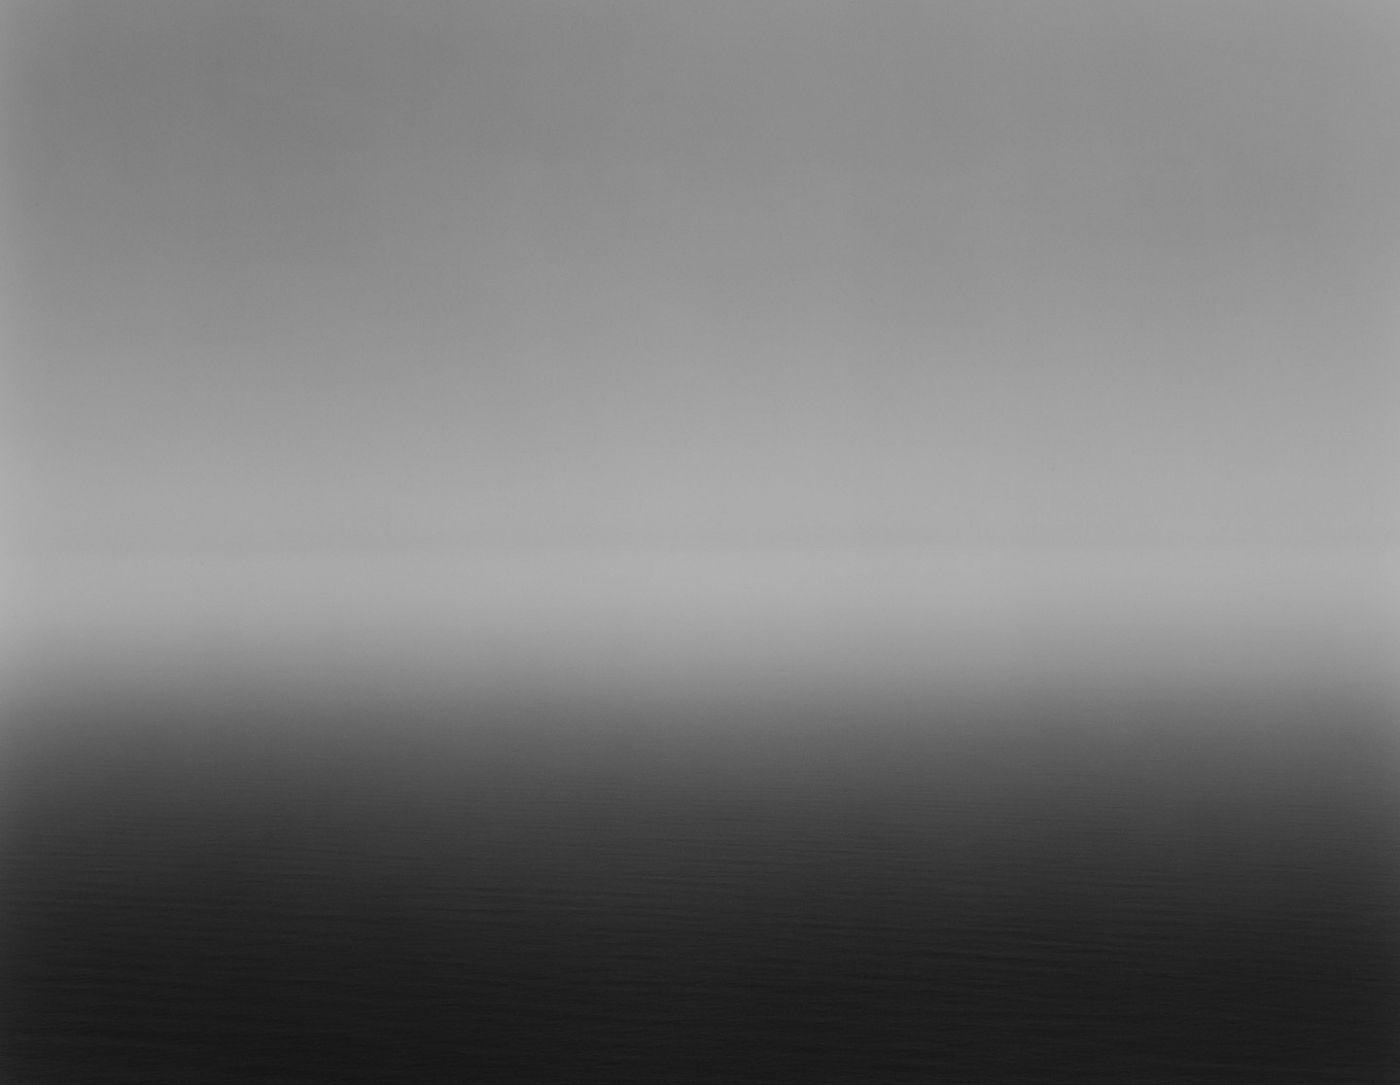 George Best Wallpapers X moreover Sunrise X Morning Ocean Beach Waves Hd K besides Vikings Ragnar Edicollector moreover  as well Rollerskaters Bat Bvenice Bbeach C Bcalifornia C B B. on ocean life